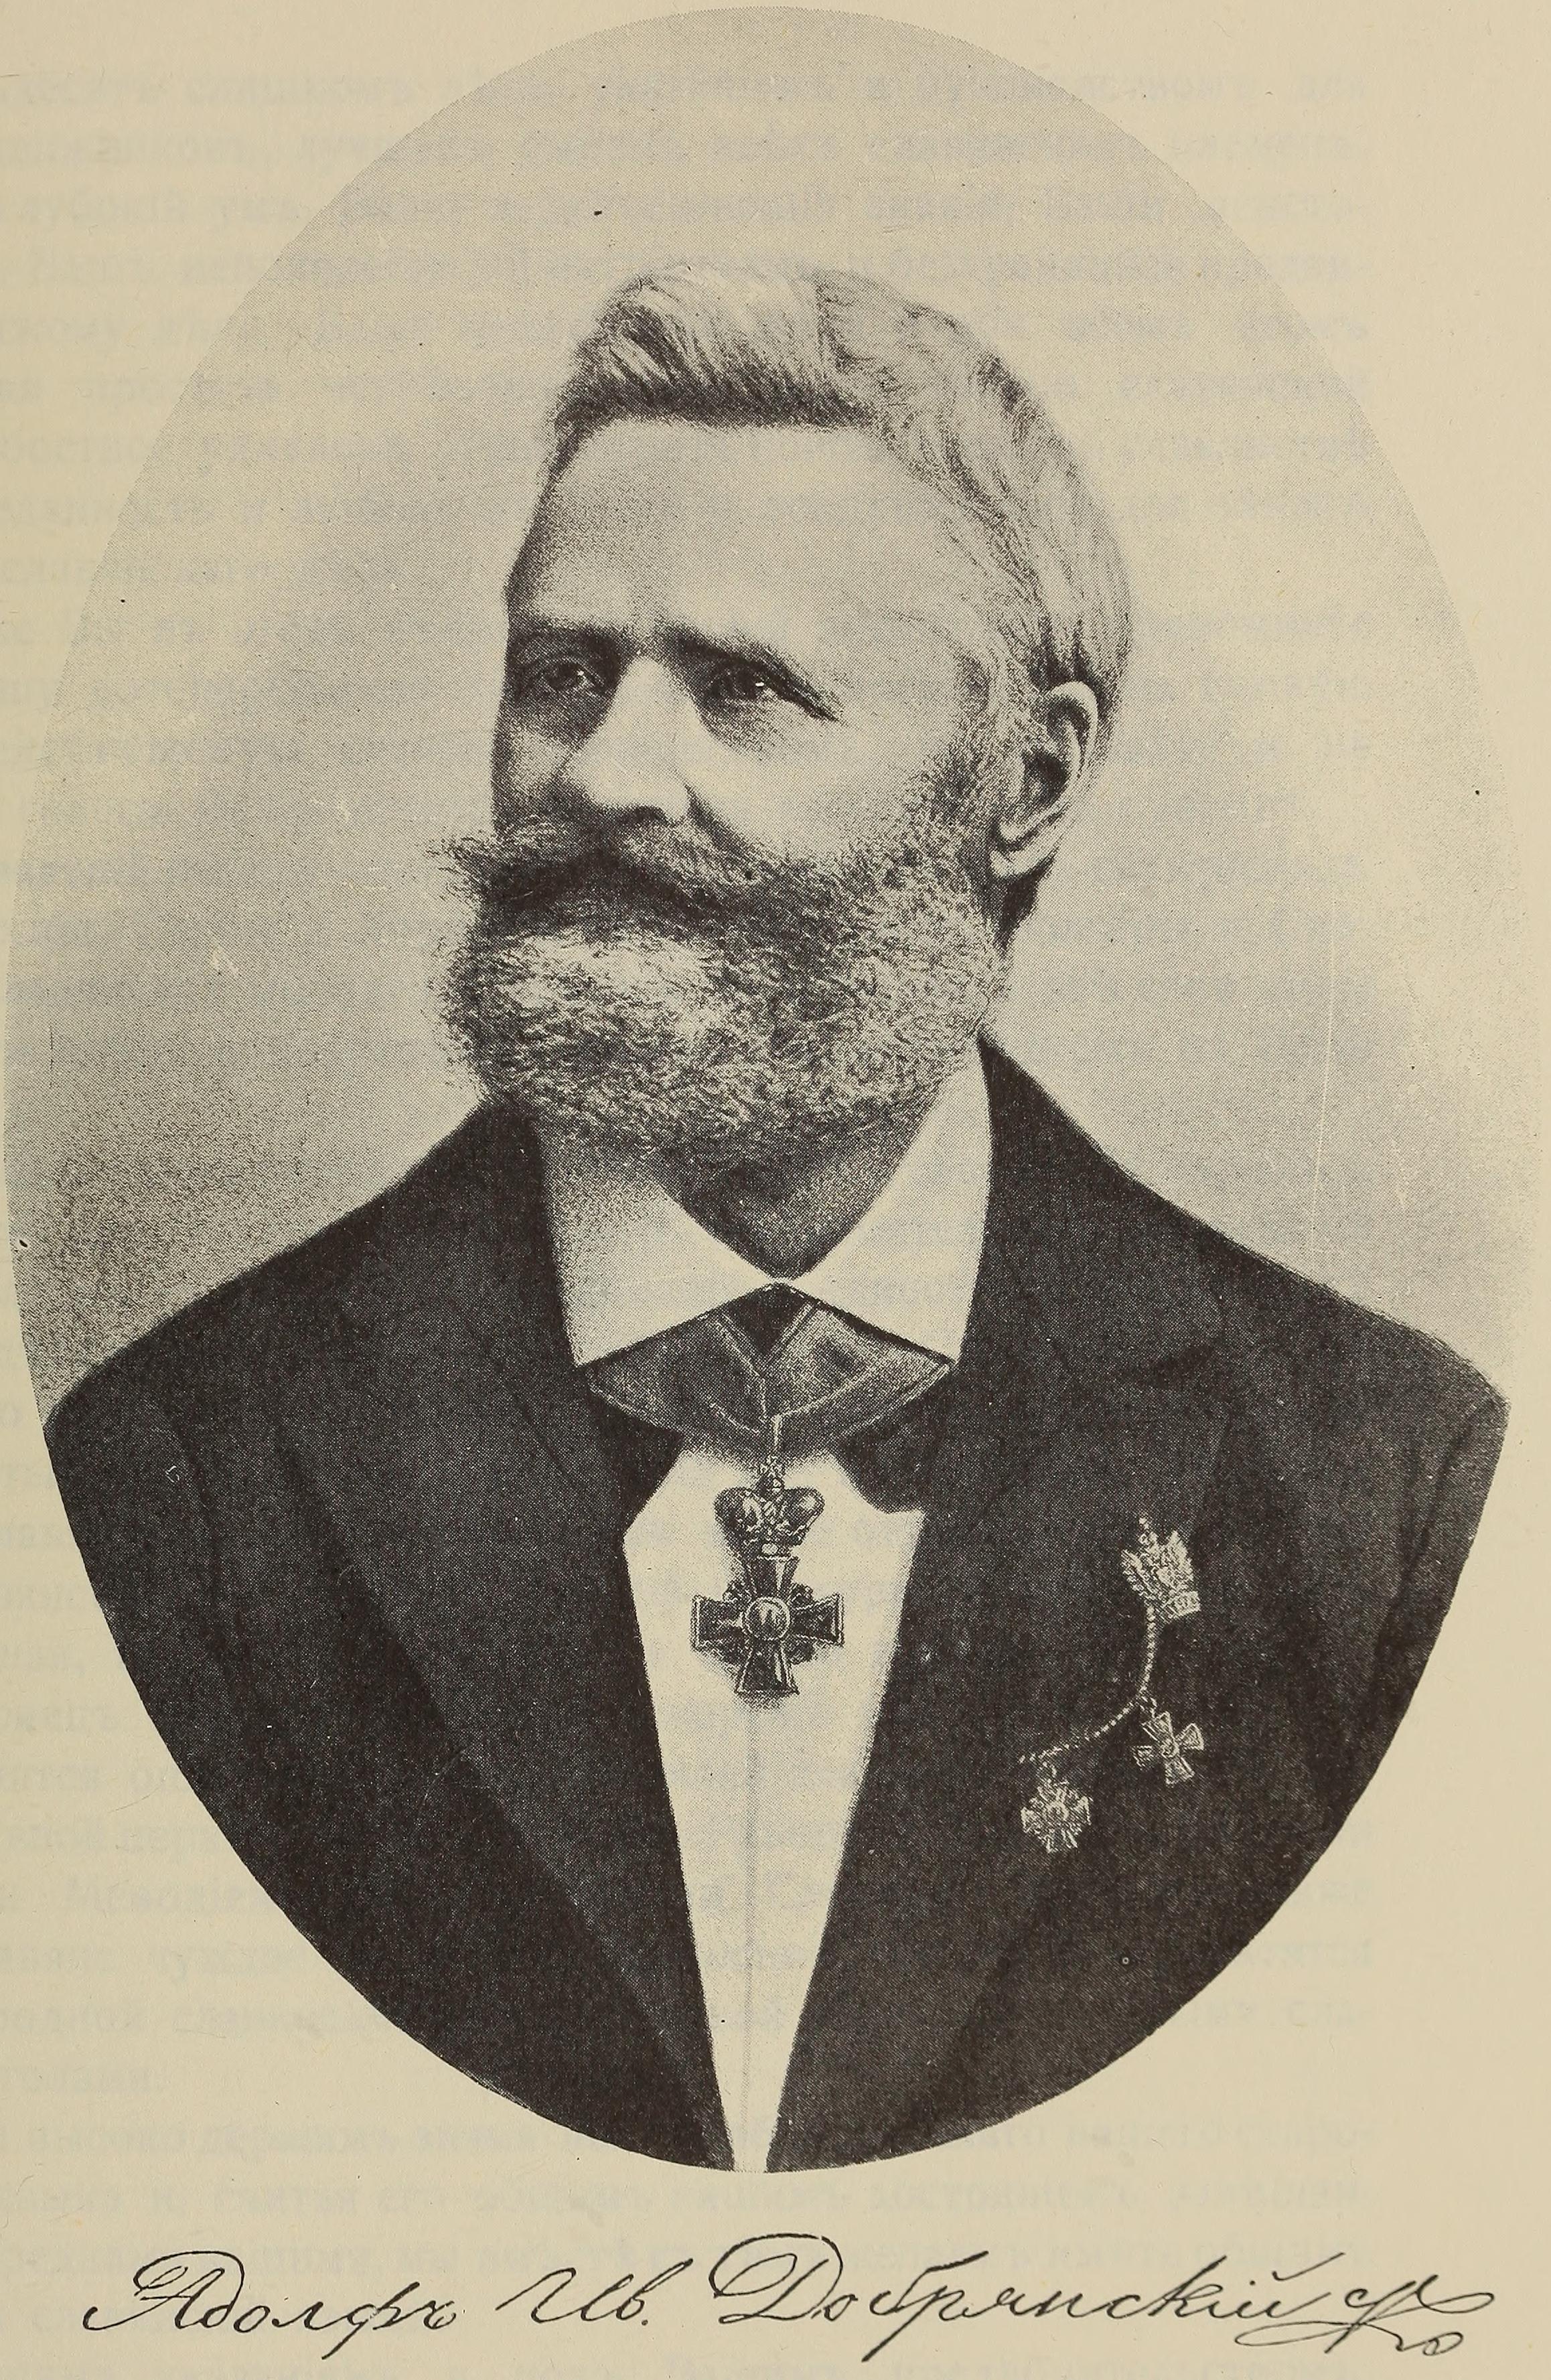 Dobrjans'kyj, Adolf Ritter von